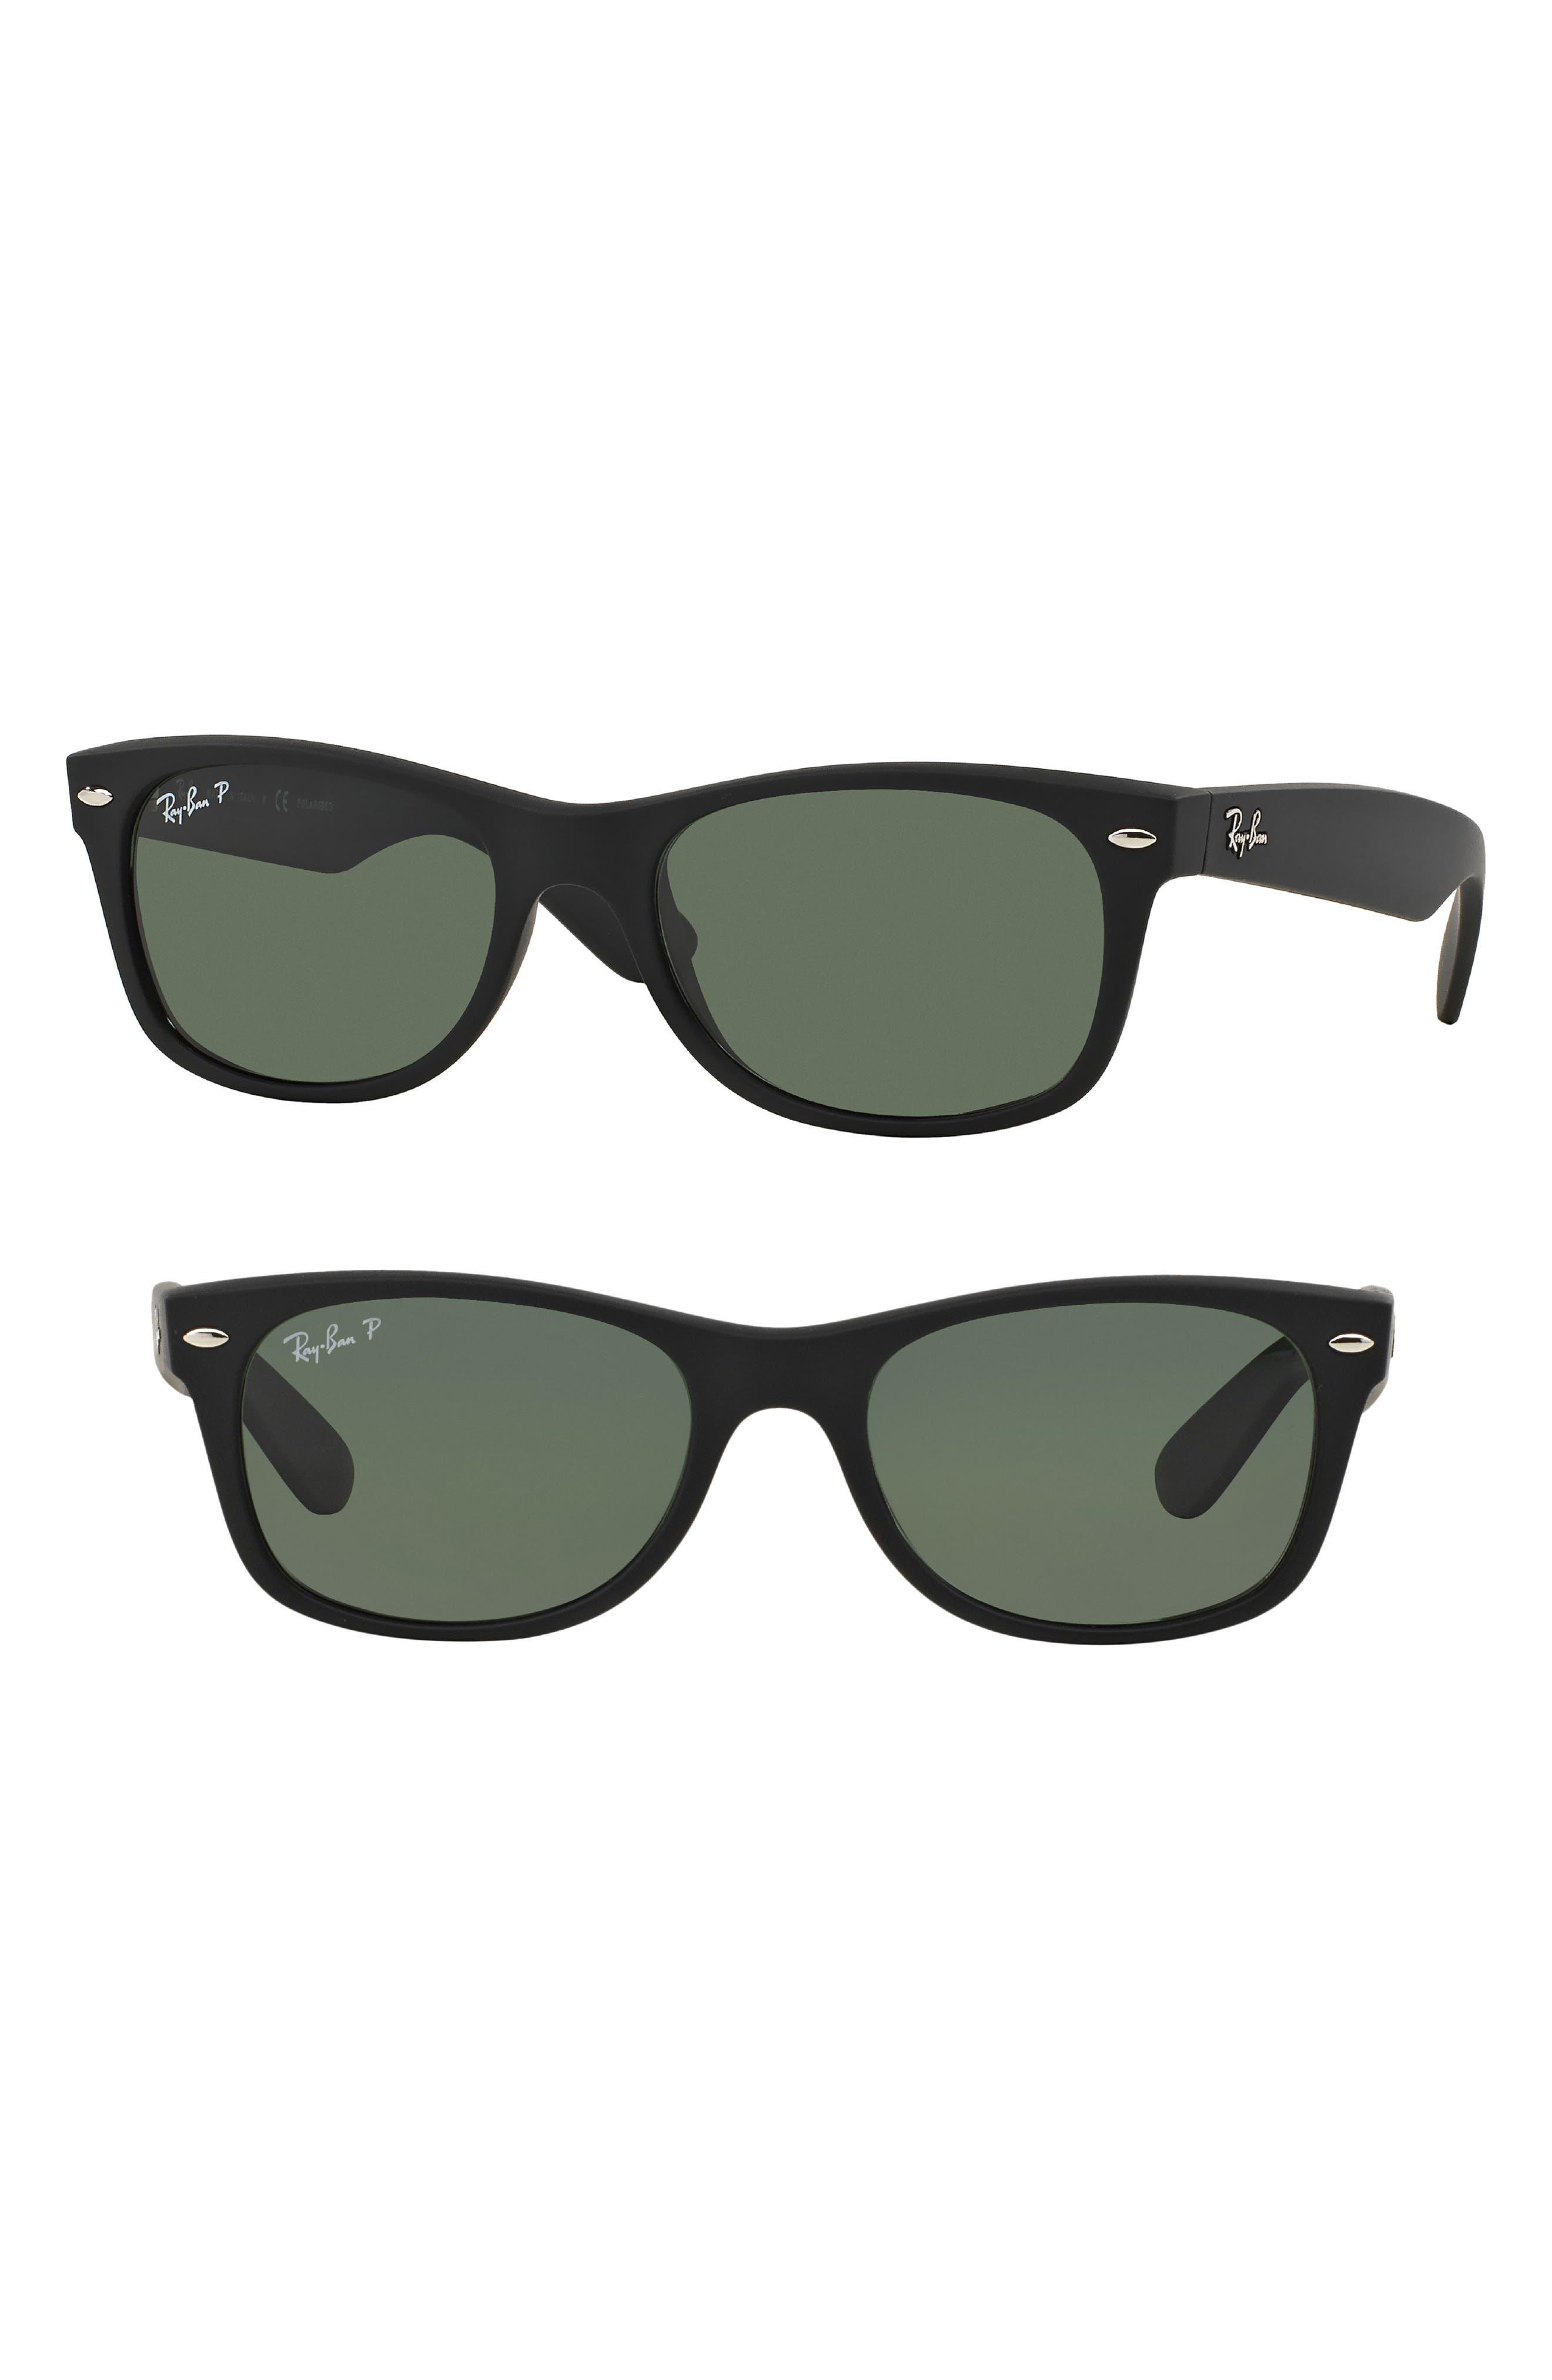 Ray-Ban Small New Wayfarer 52mm Polarized Sunglasses